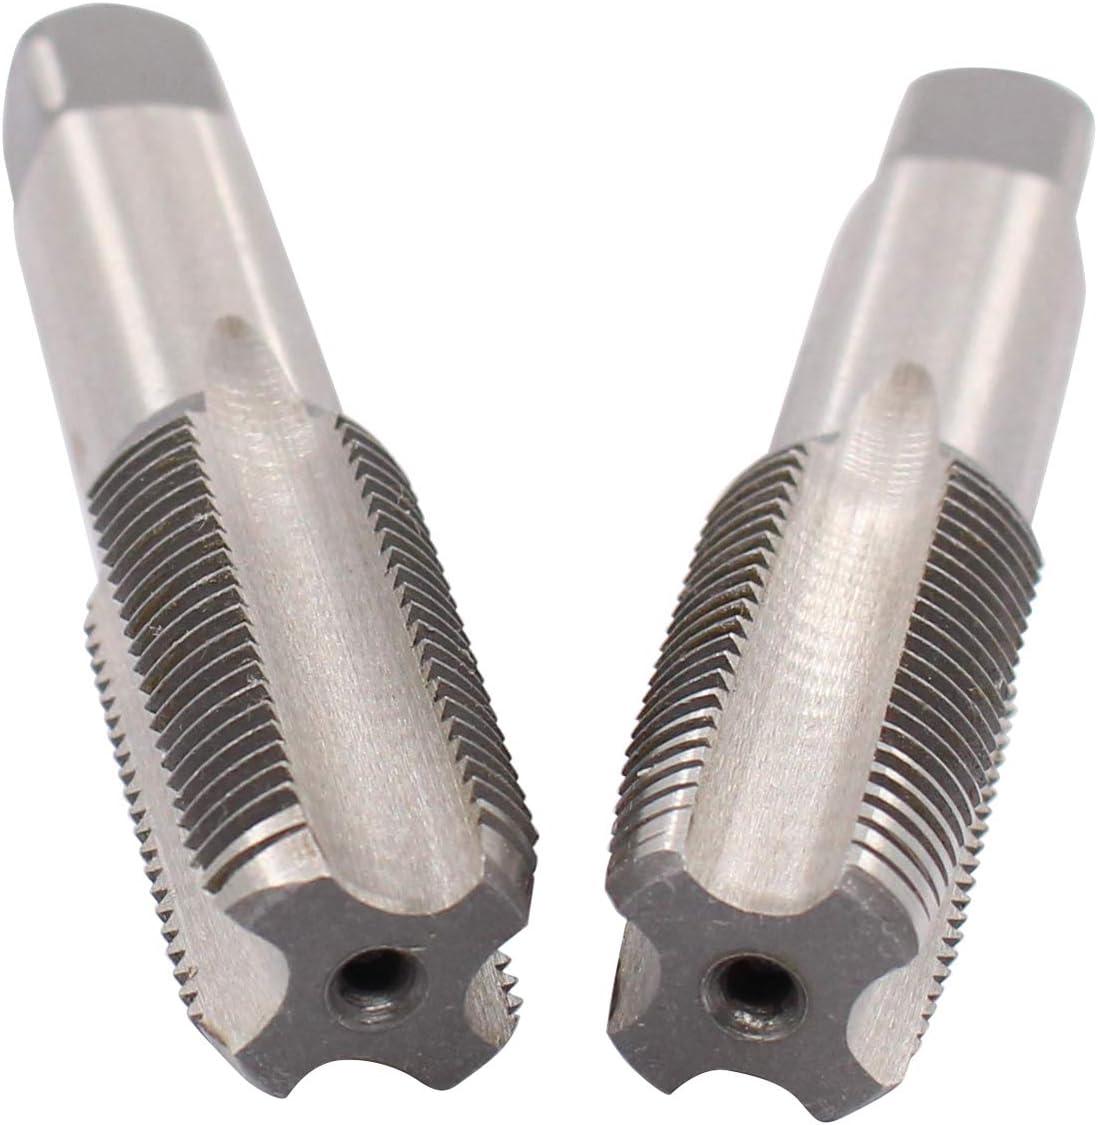 ApplianPar 18mm x 1.5 HSS Taper and M18 x 1.5mm Pitch Plug Tap Right Hand Set of 2